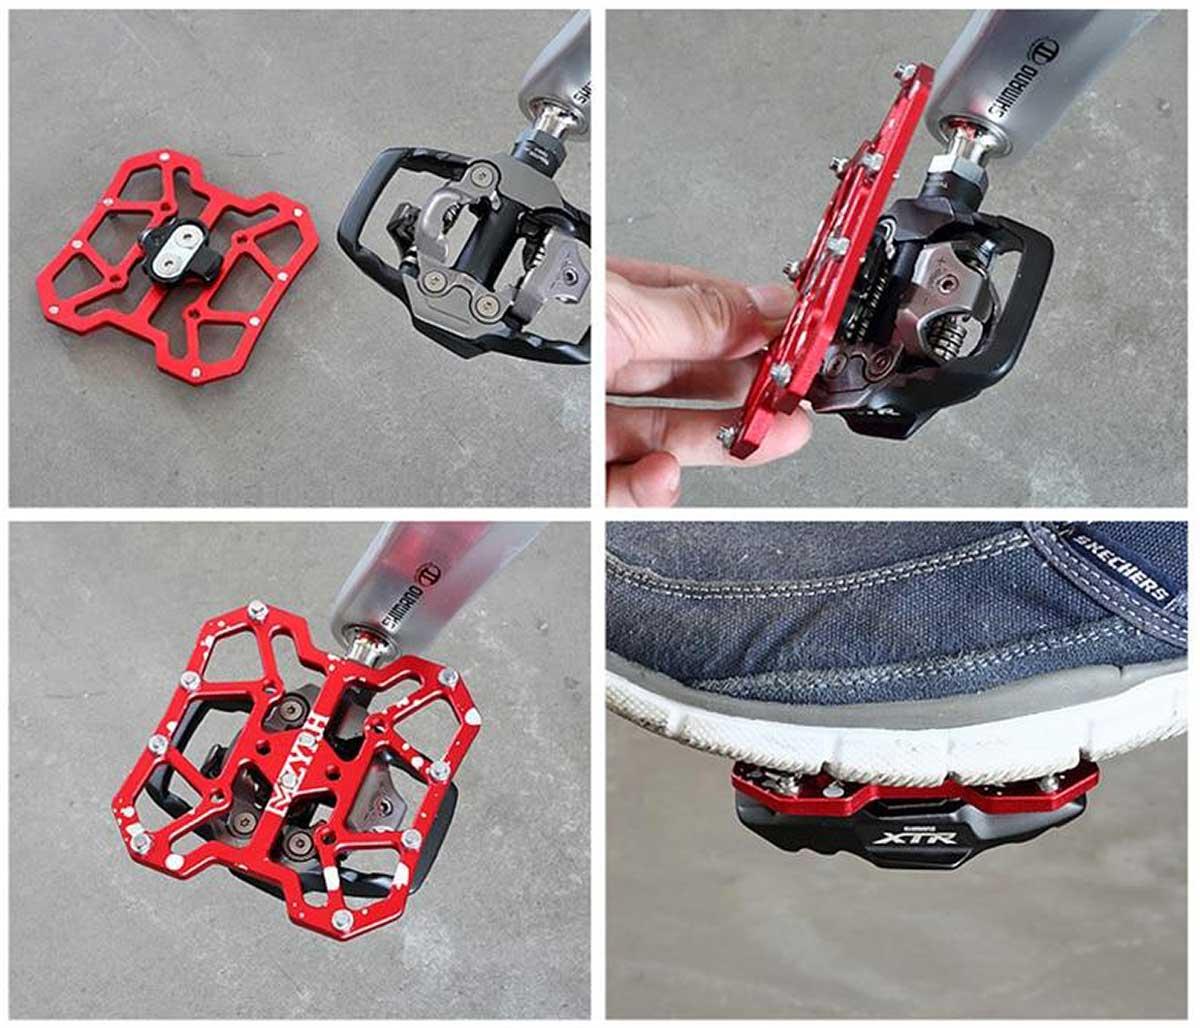 install crankwork clipless pedal adapter flat platform